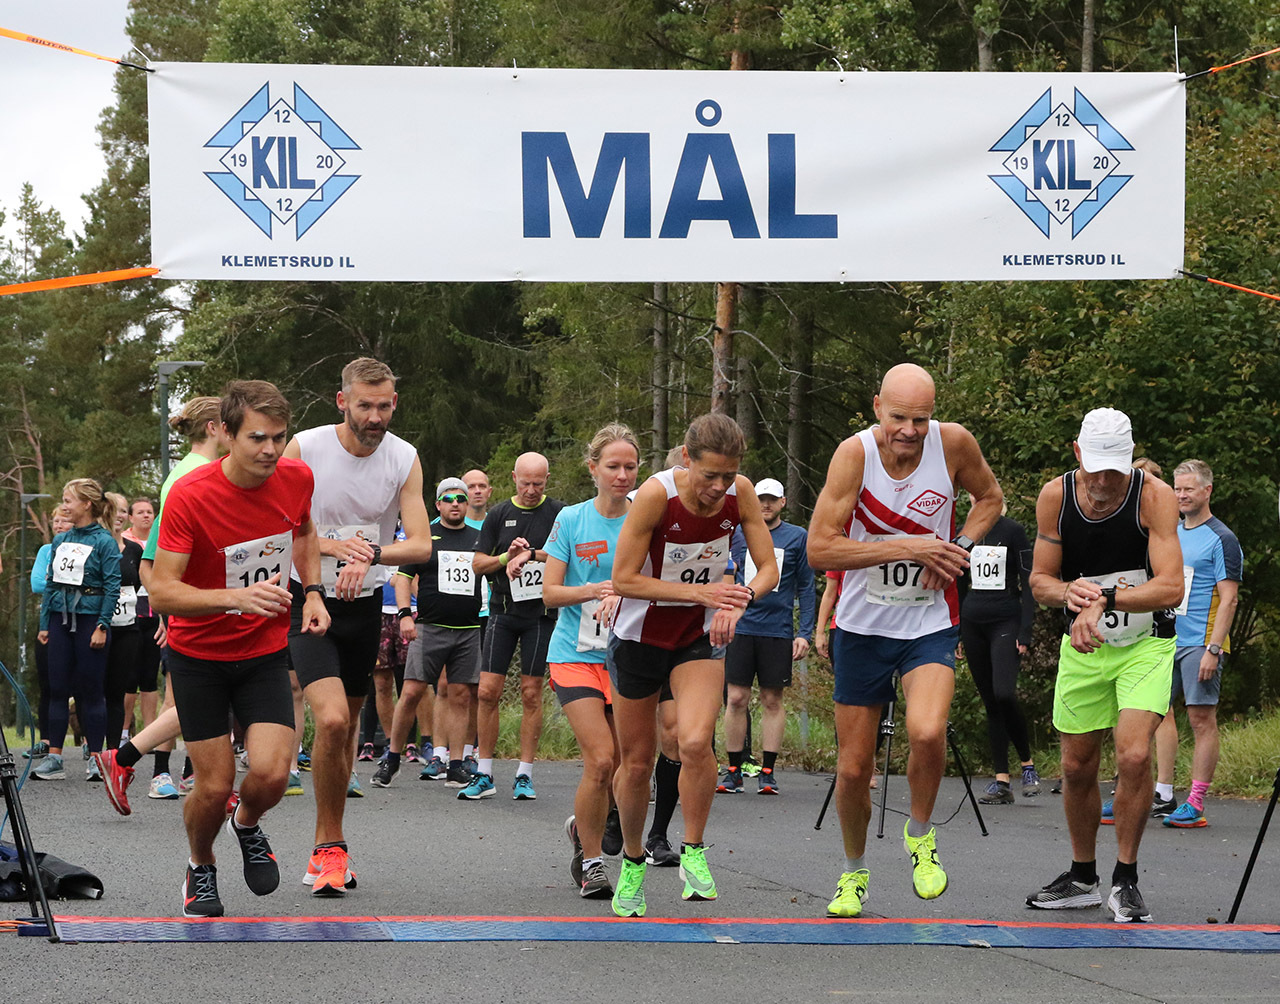 Start_10km_4S7A4136.jpg